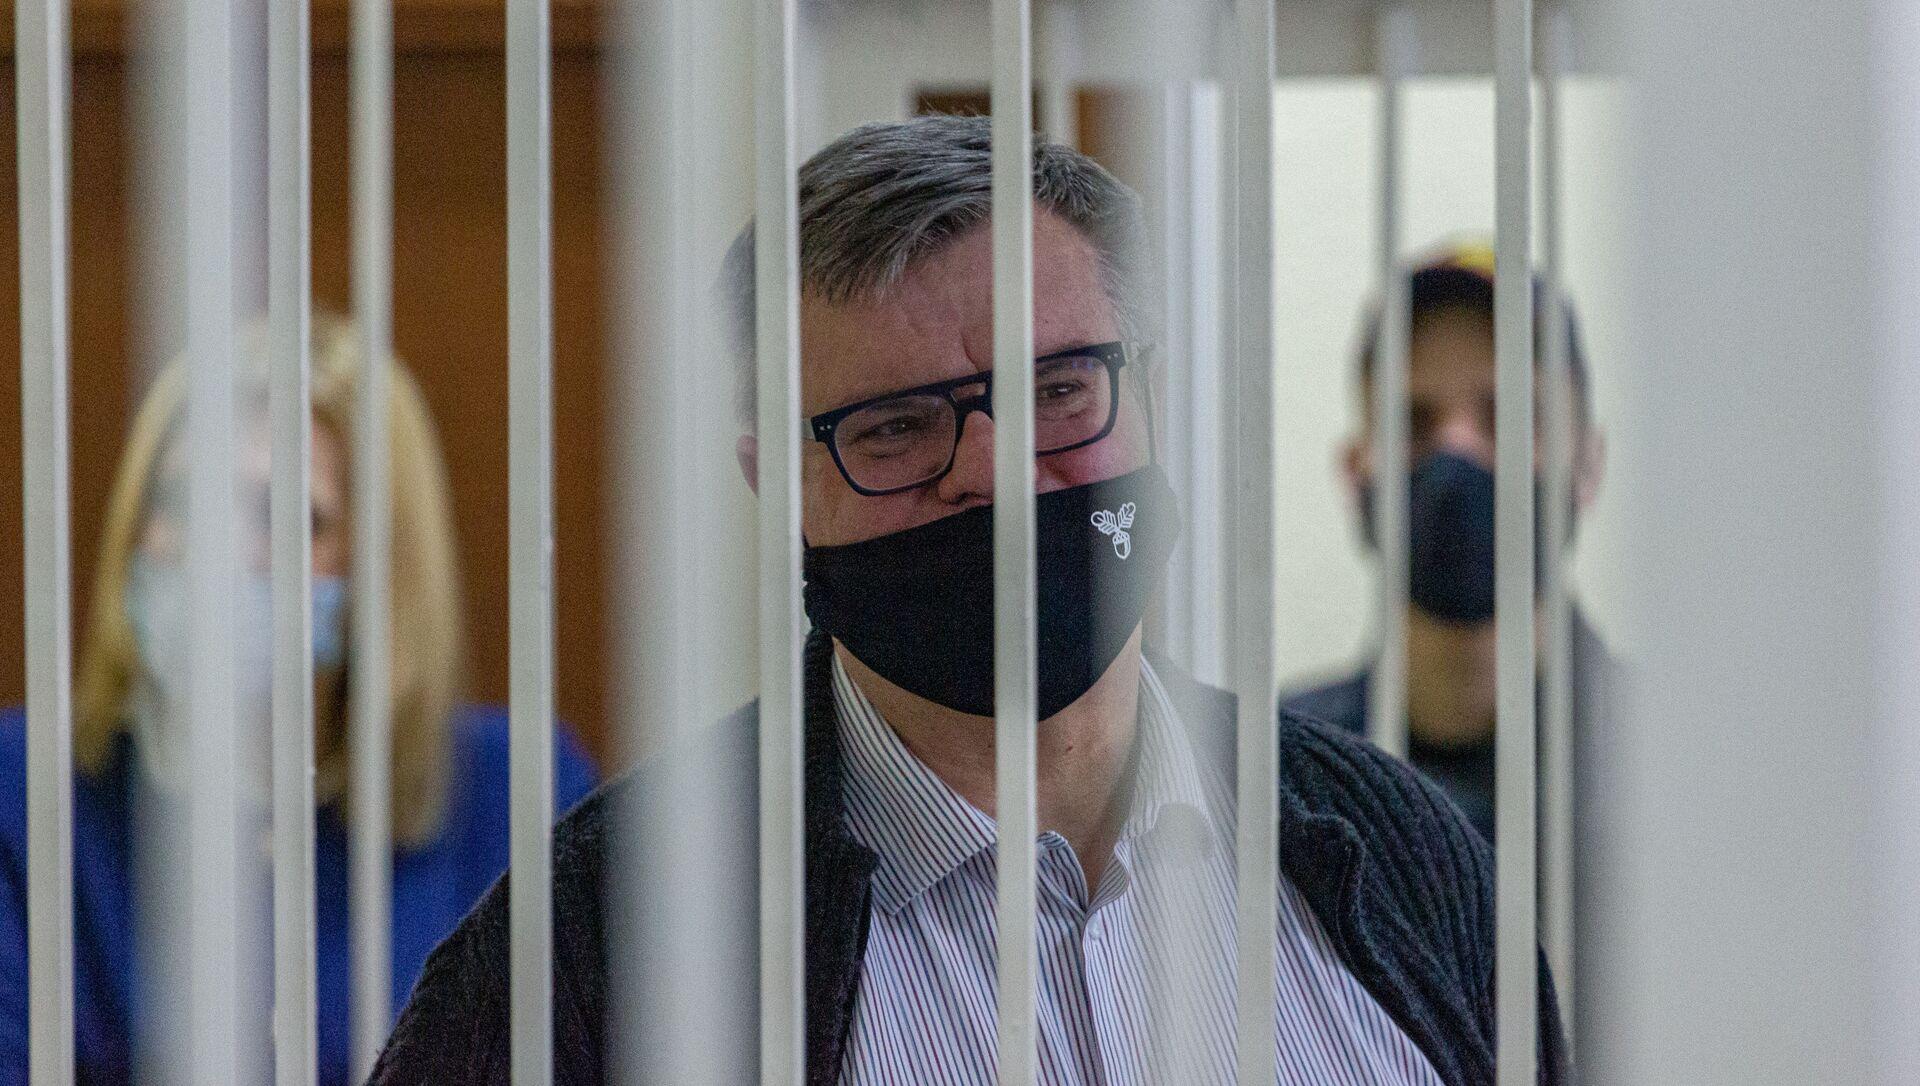 Виктор Бабарико в суде - Sputnik Беларусь, 1920, 18.03.2021